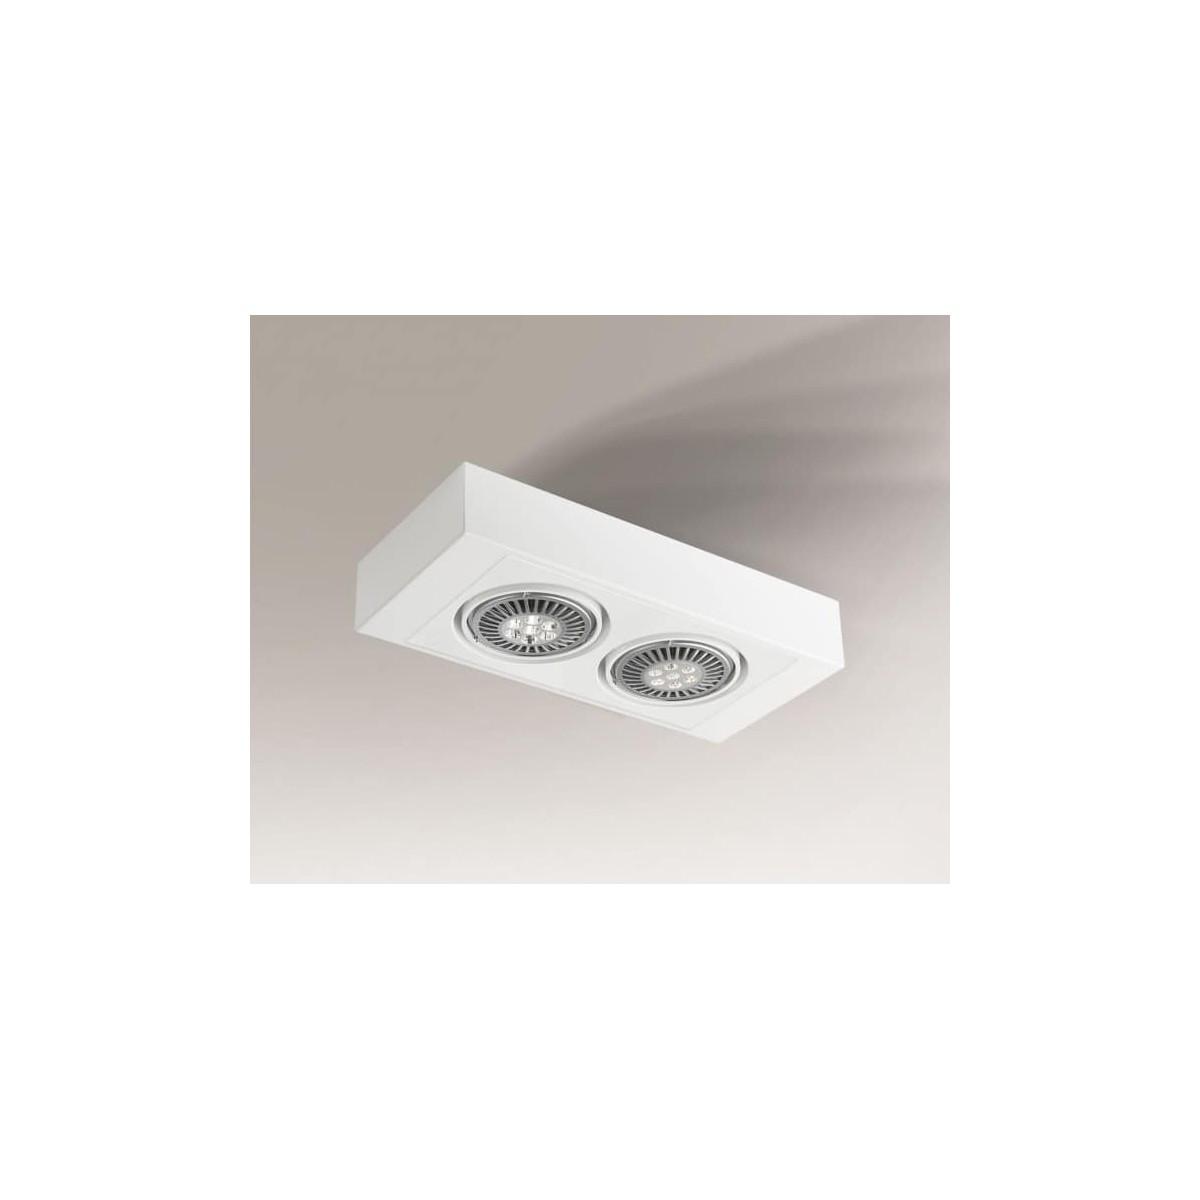 Shilo KOGA H 2xES111 230V biały natynkowa 7124